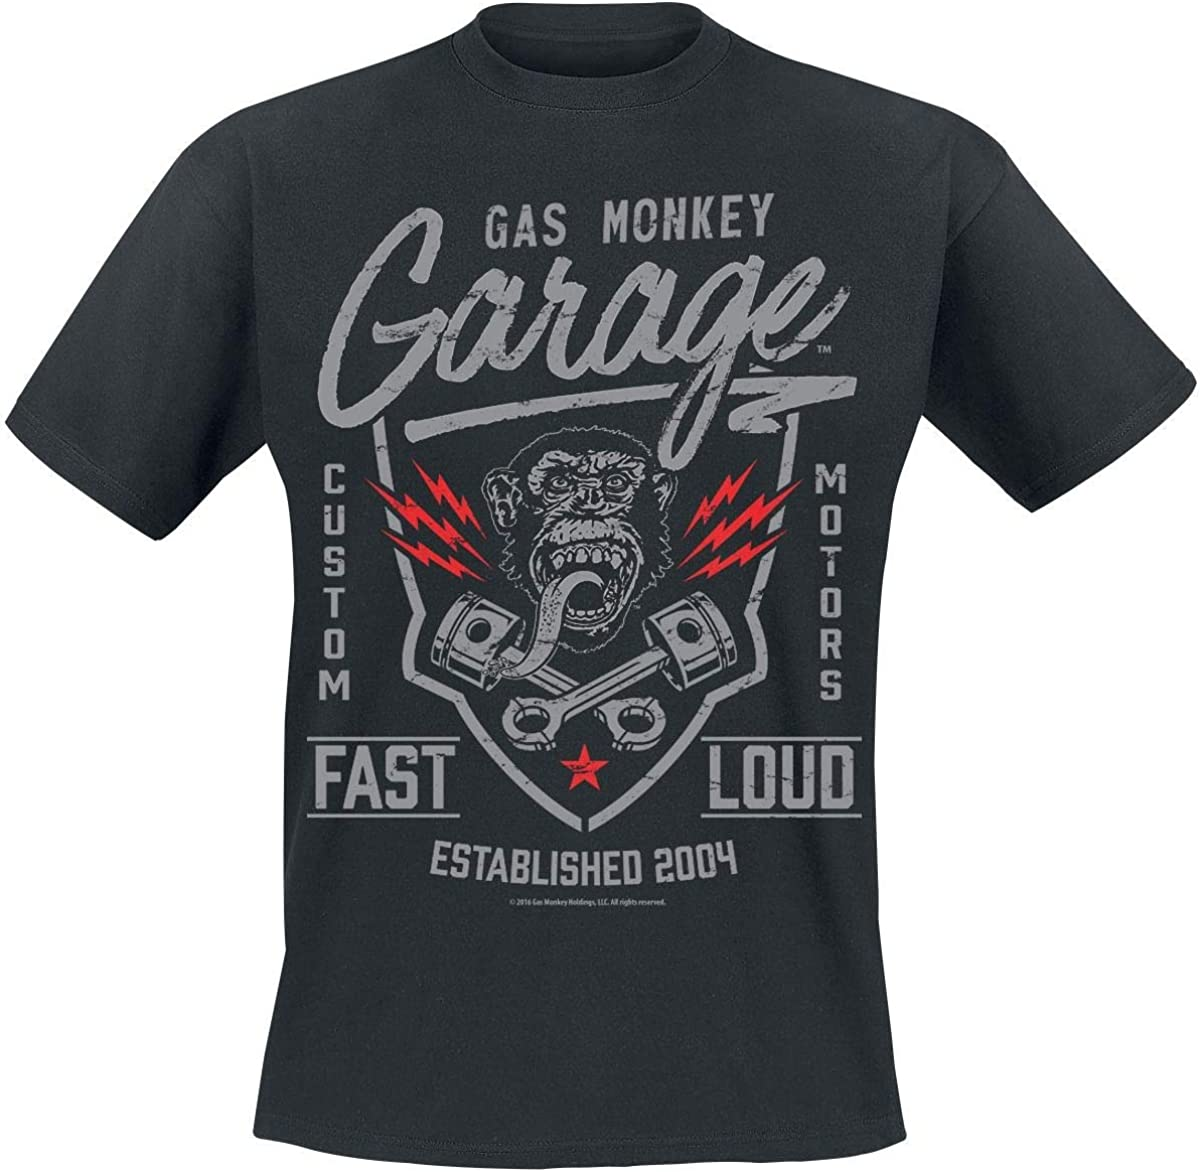 TALLA M. Gas Monkey Garage Shirt Fast N Loud Classic Logo Oficial de Los Hombres Nuevo